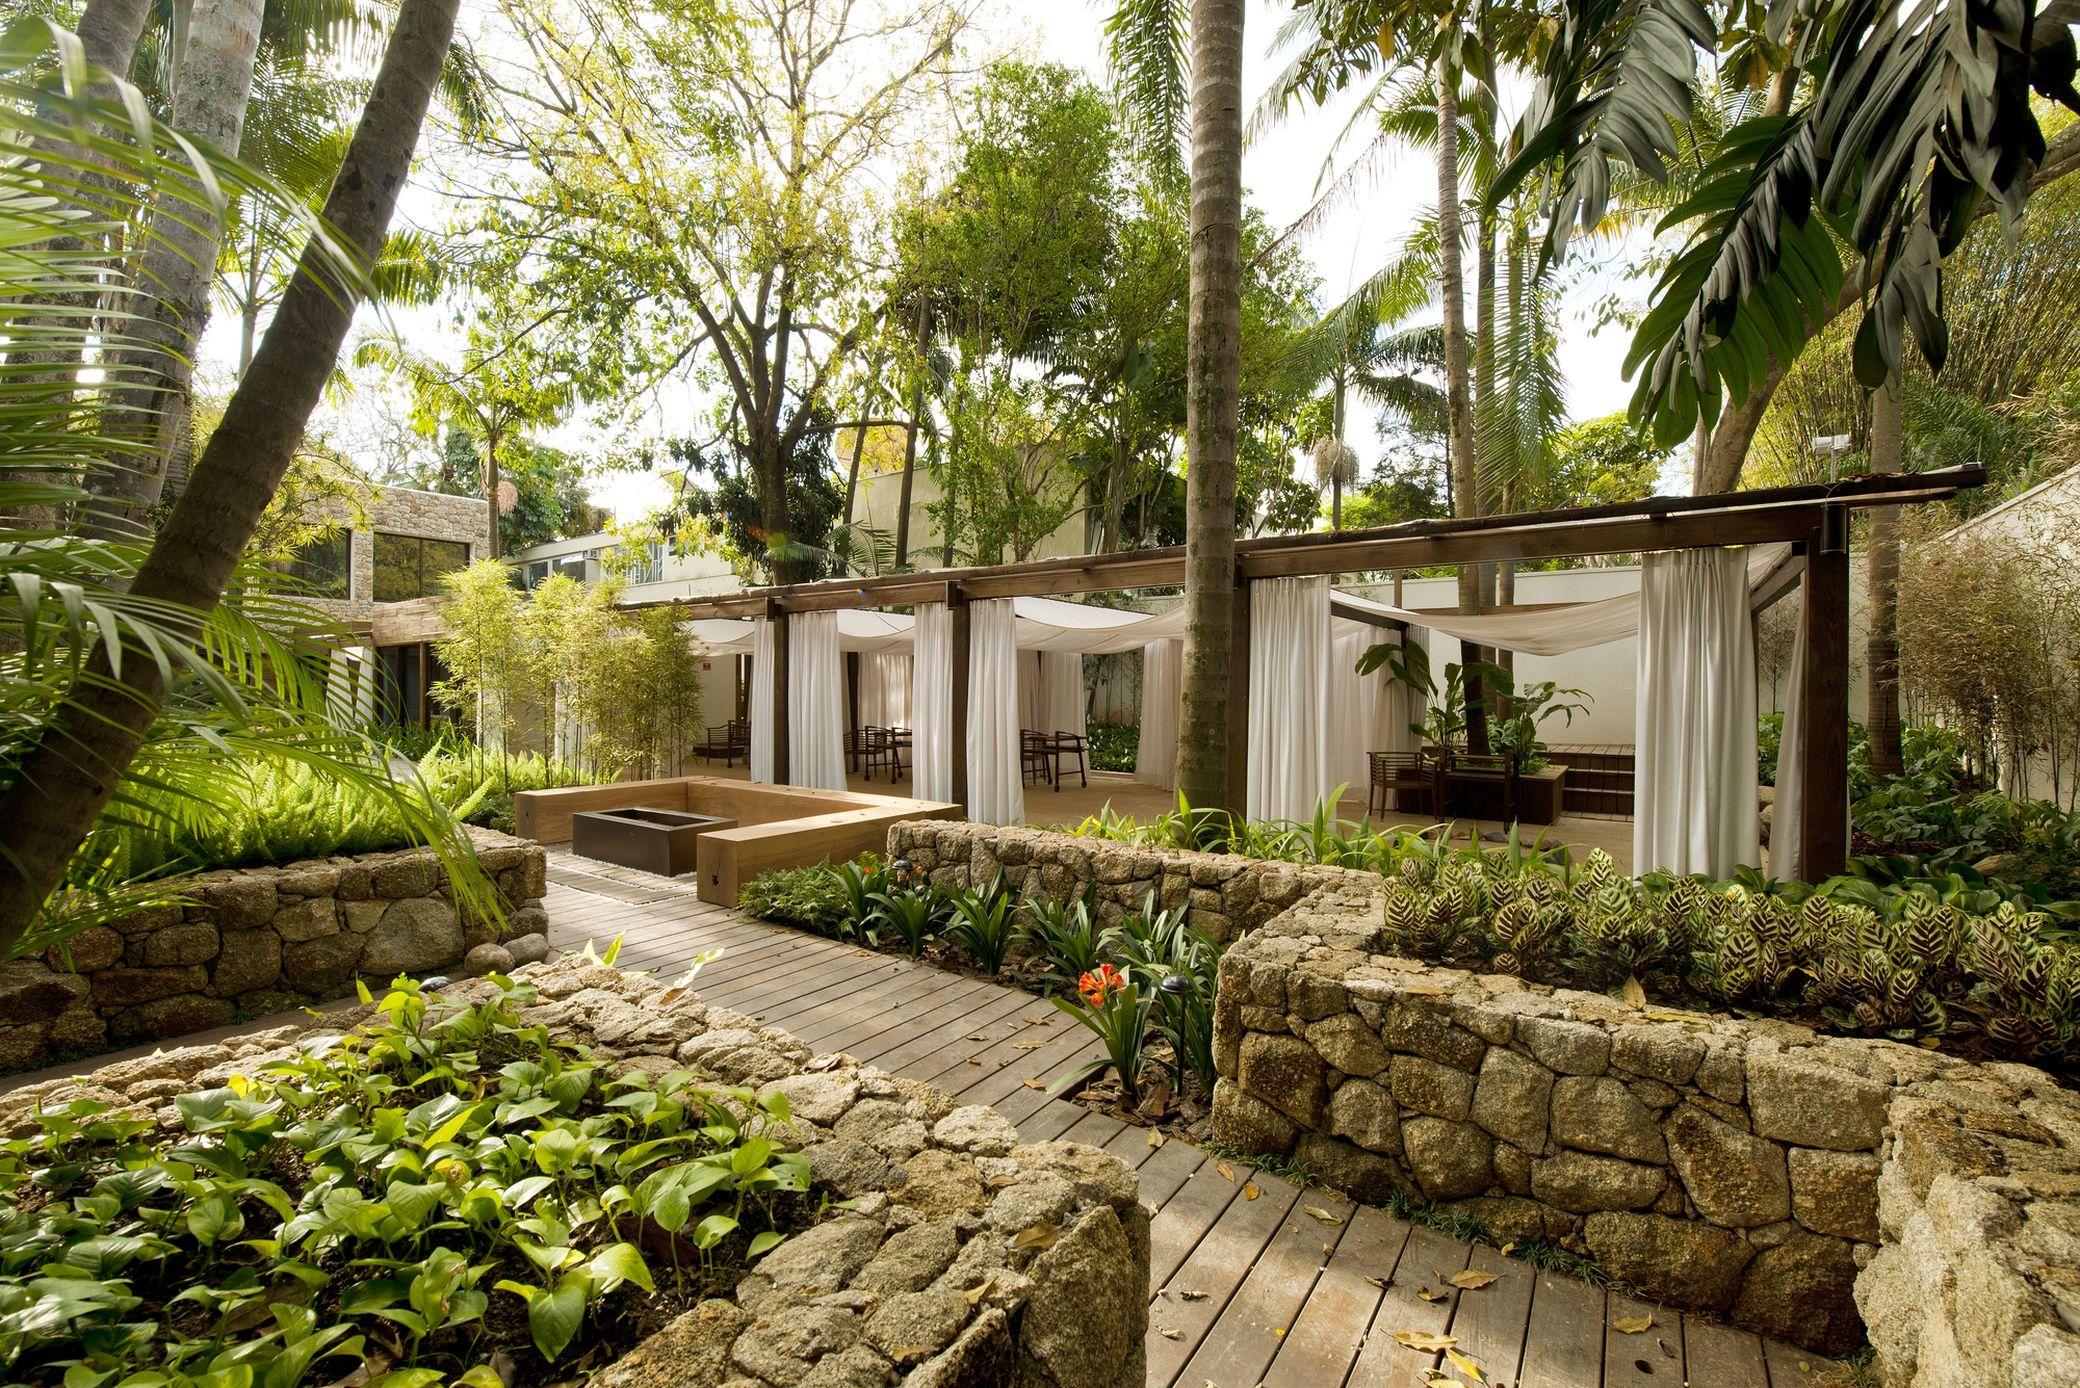 kennzur spa zize zink arquitetura arch2o com in 2020 tropical landscape design spa on zink outdoor kitchen id=26881